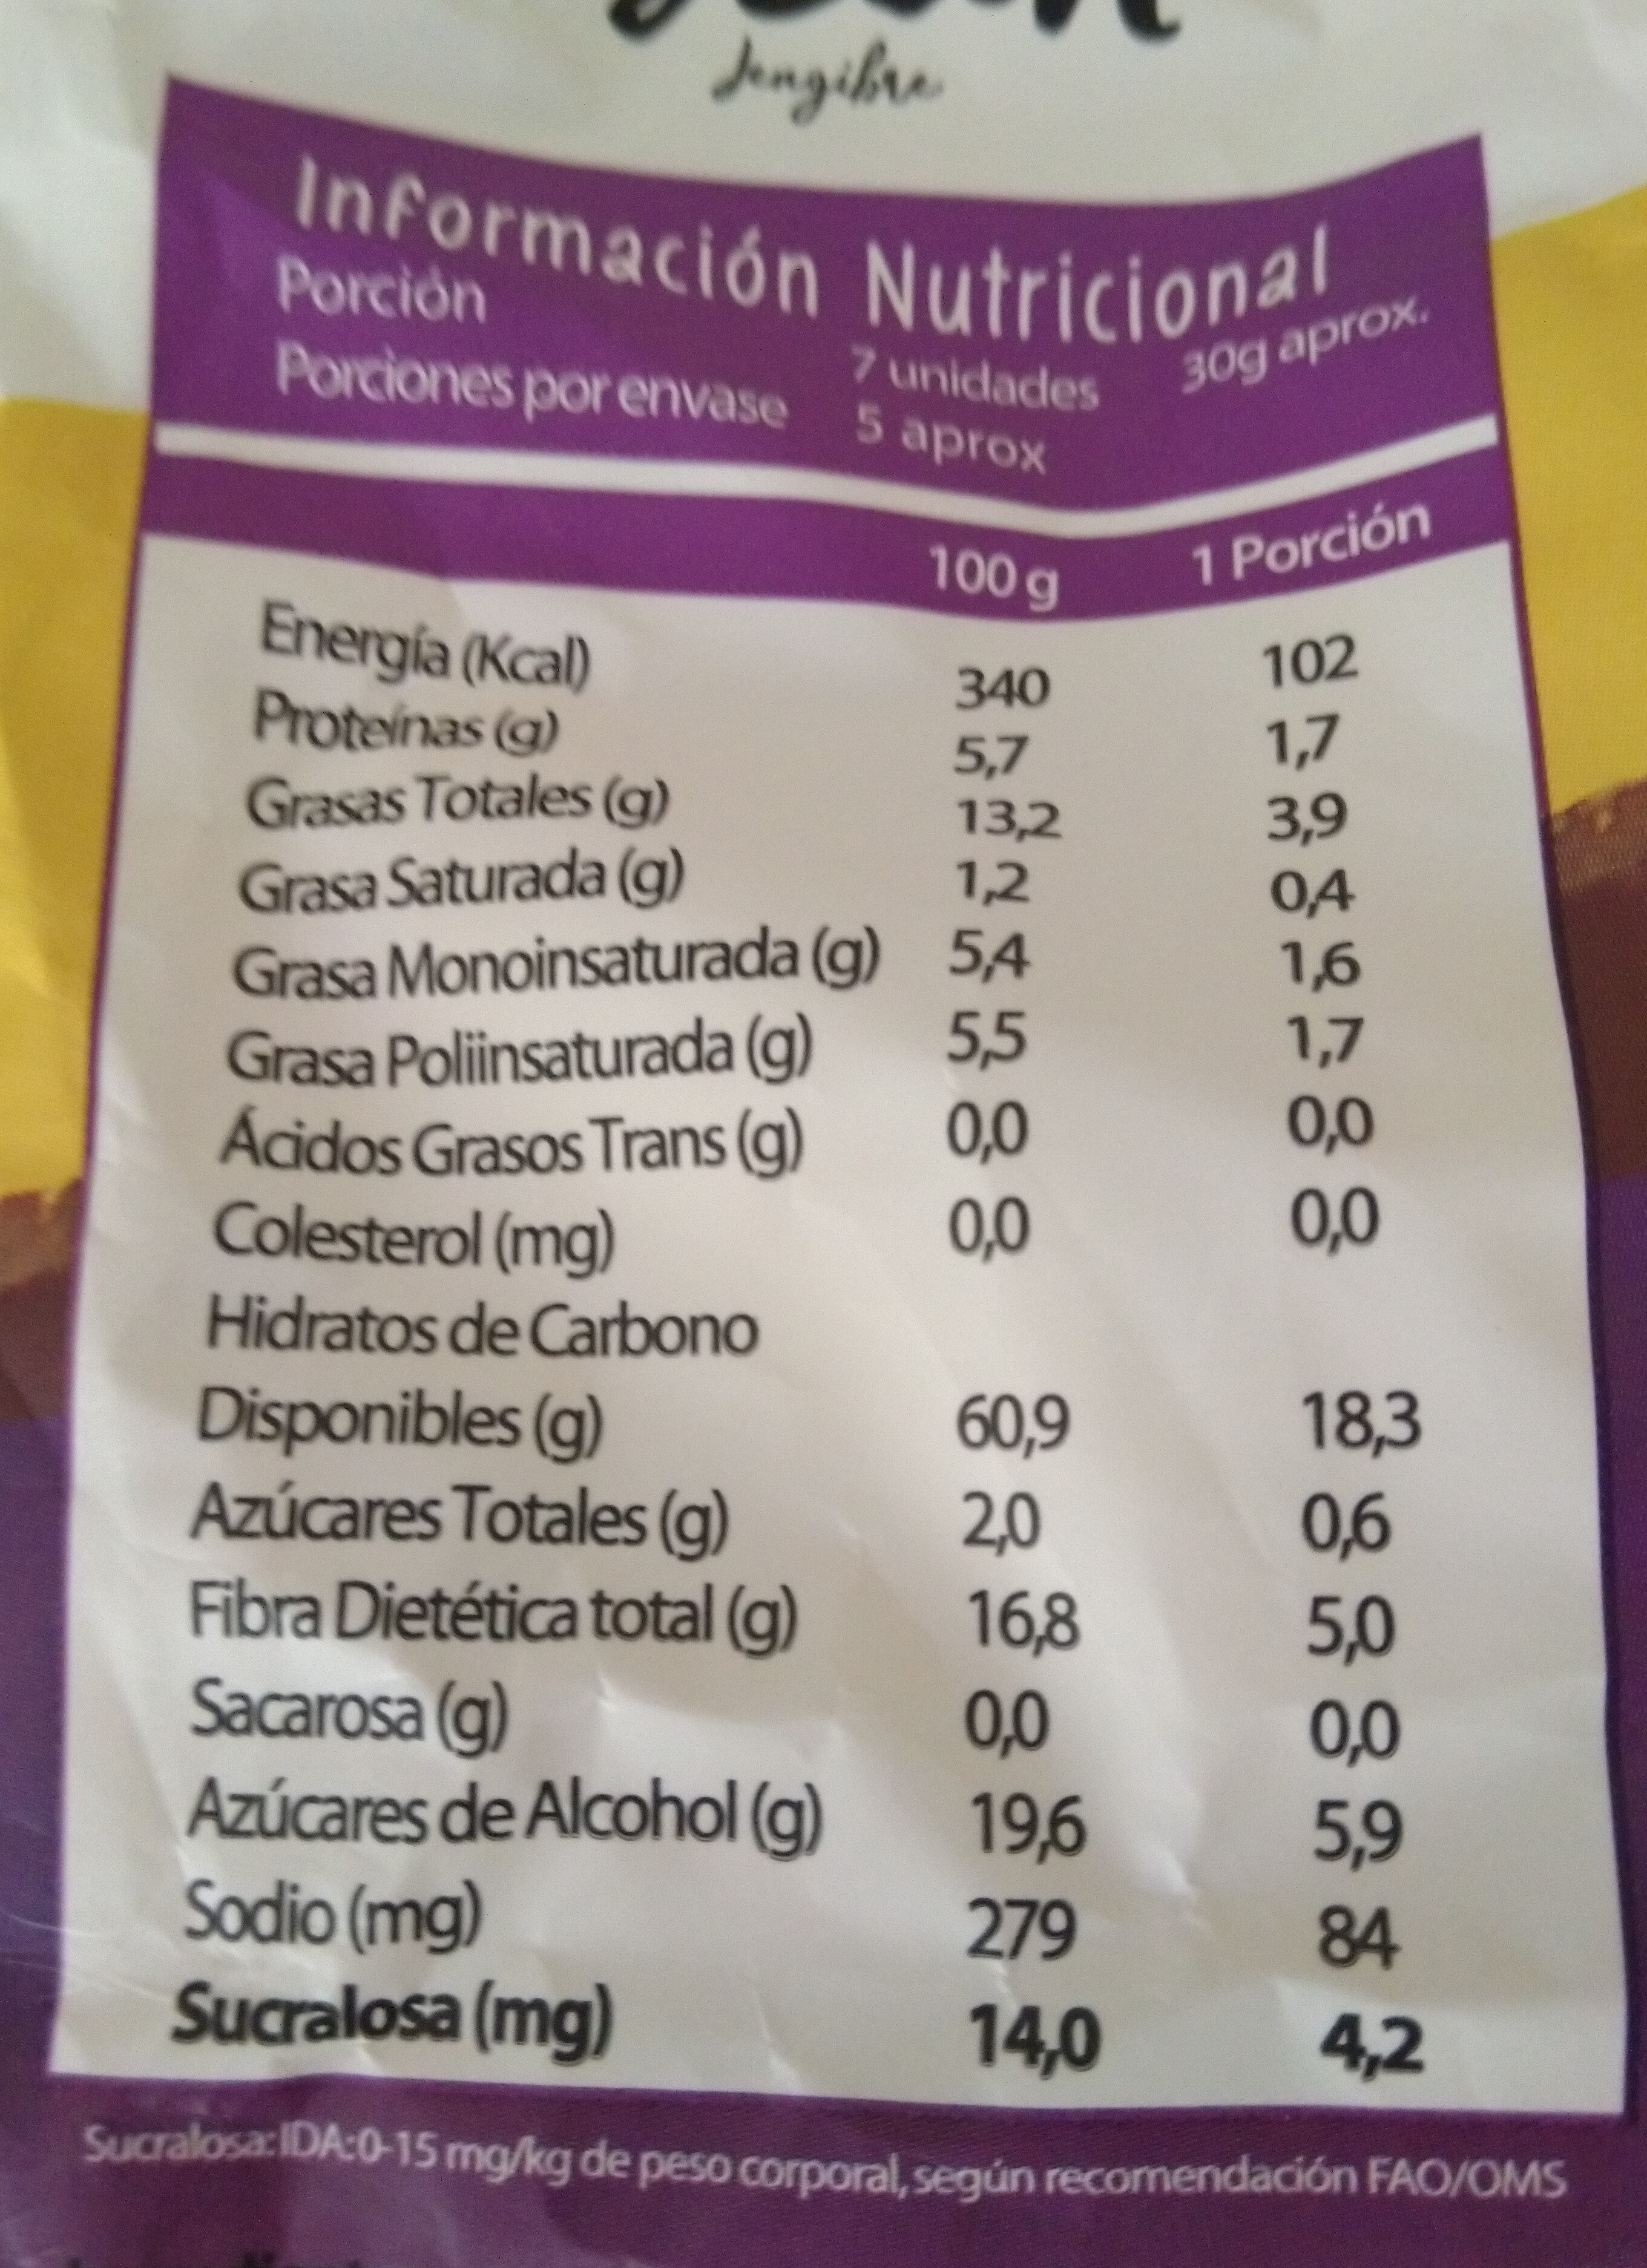 Biscuit Jengibre - Nutrition facts - es